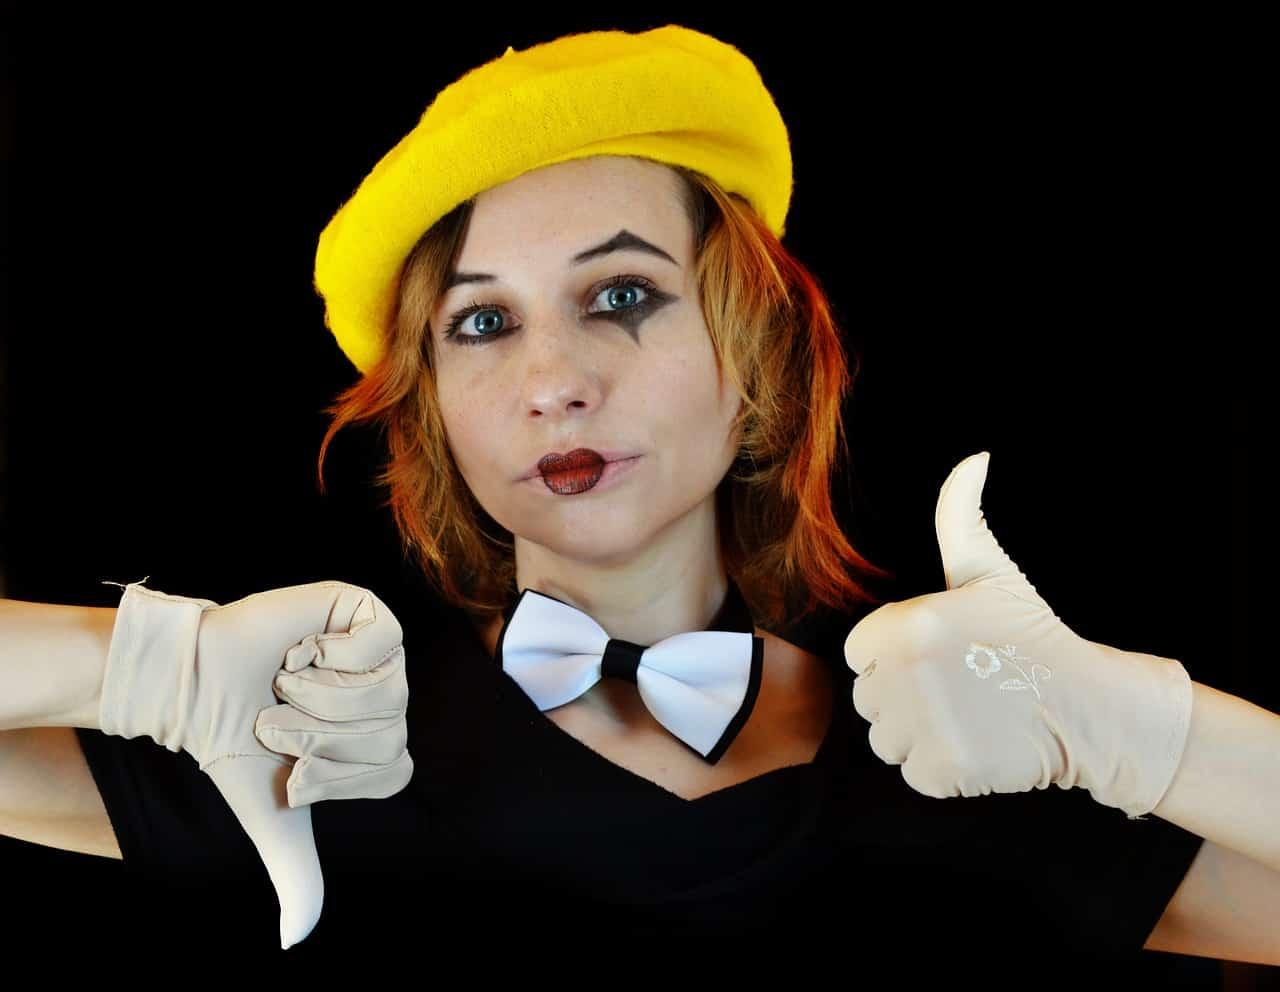 clown mime thumbs up thumbs down